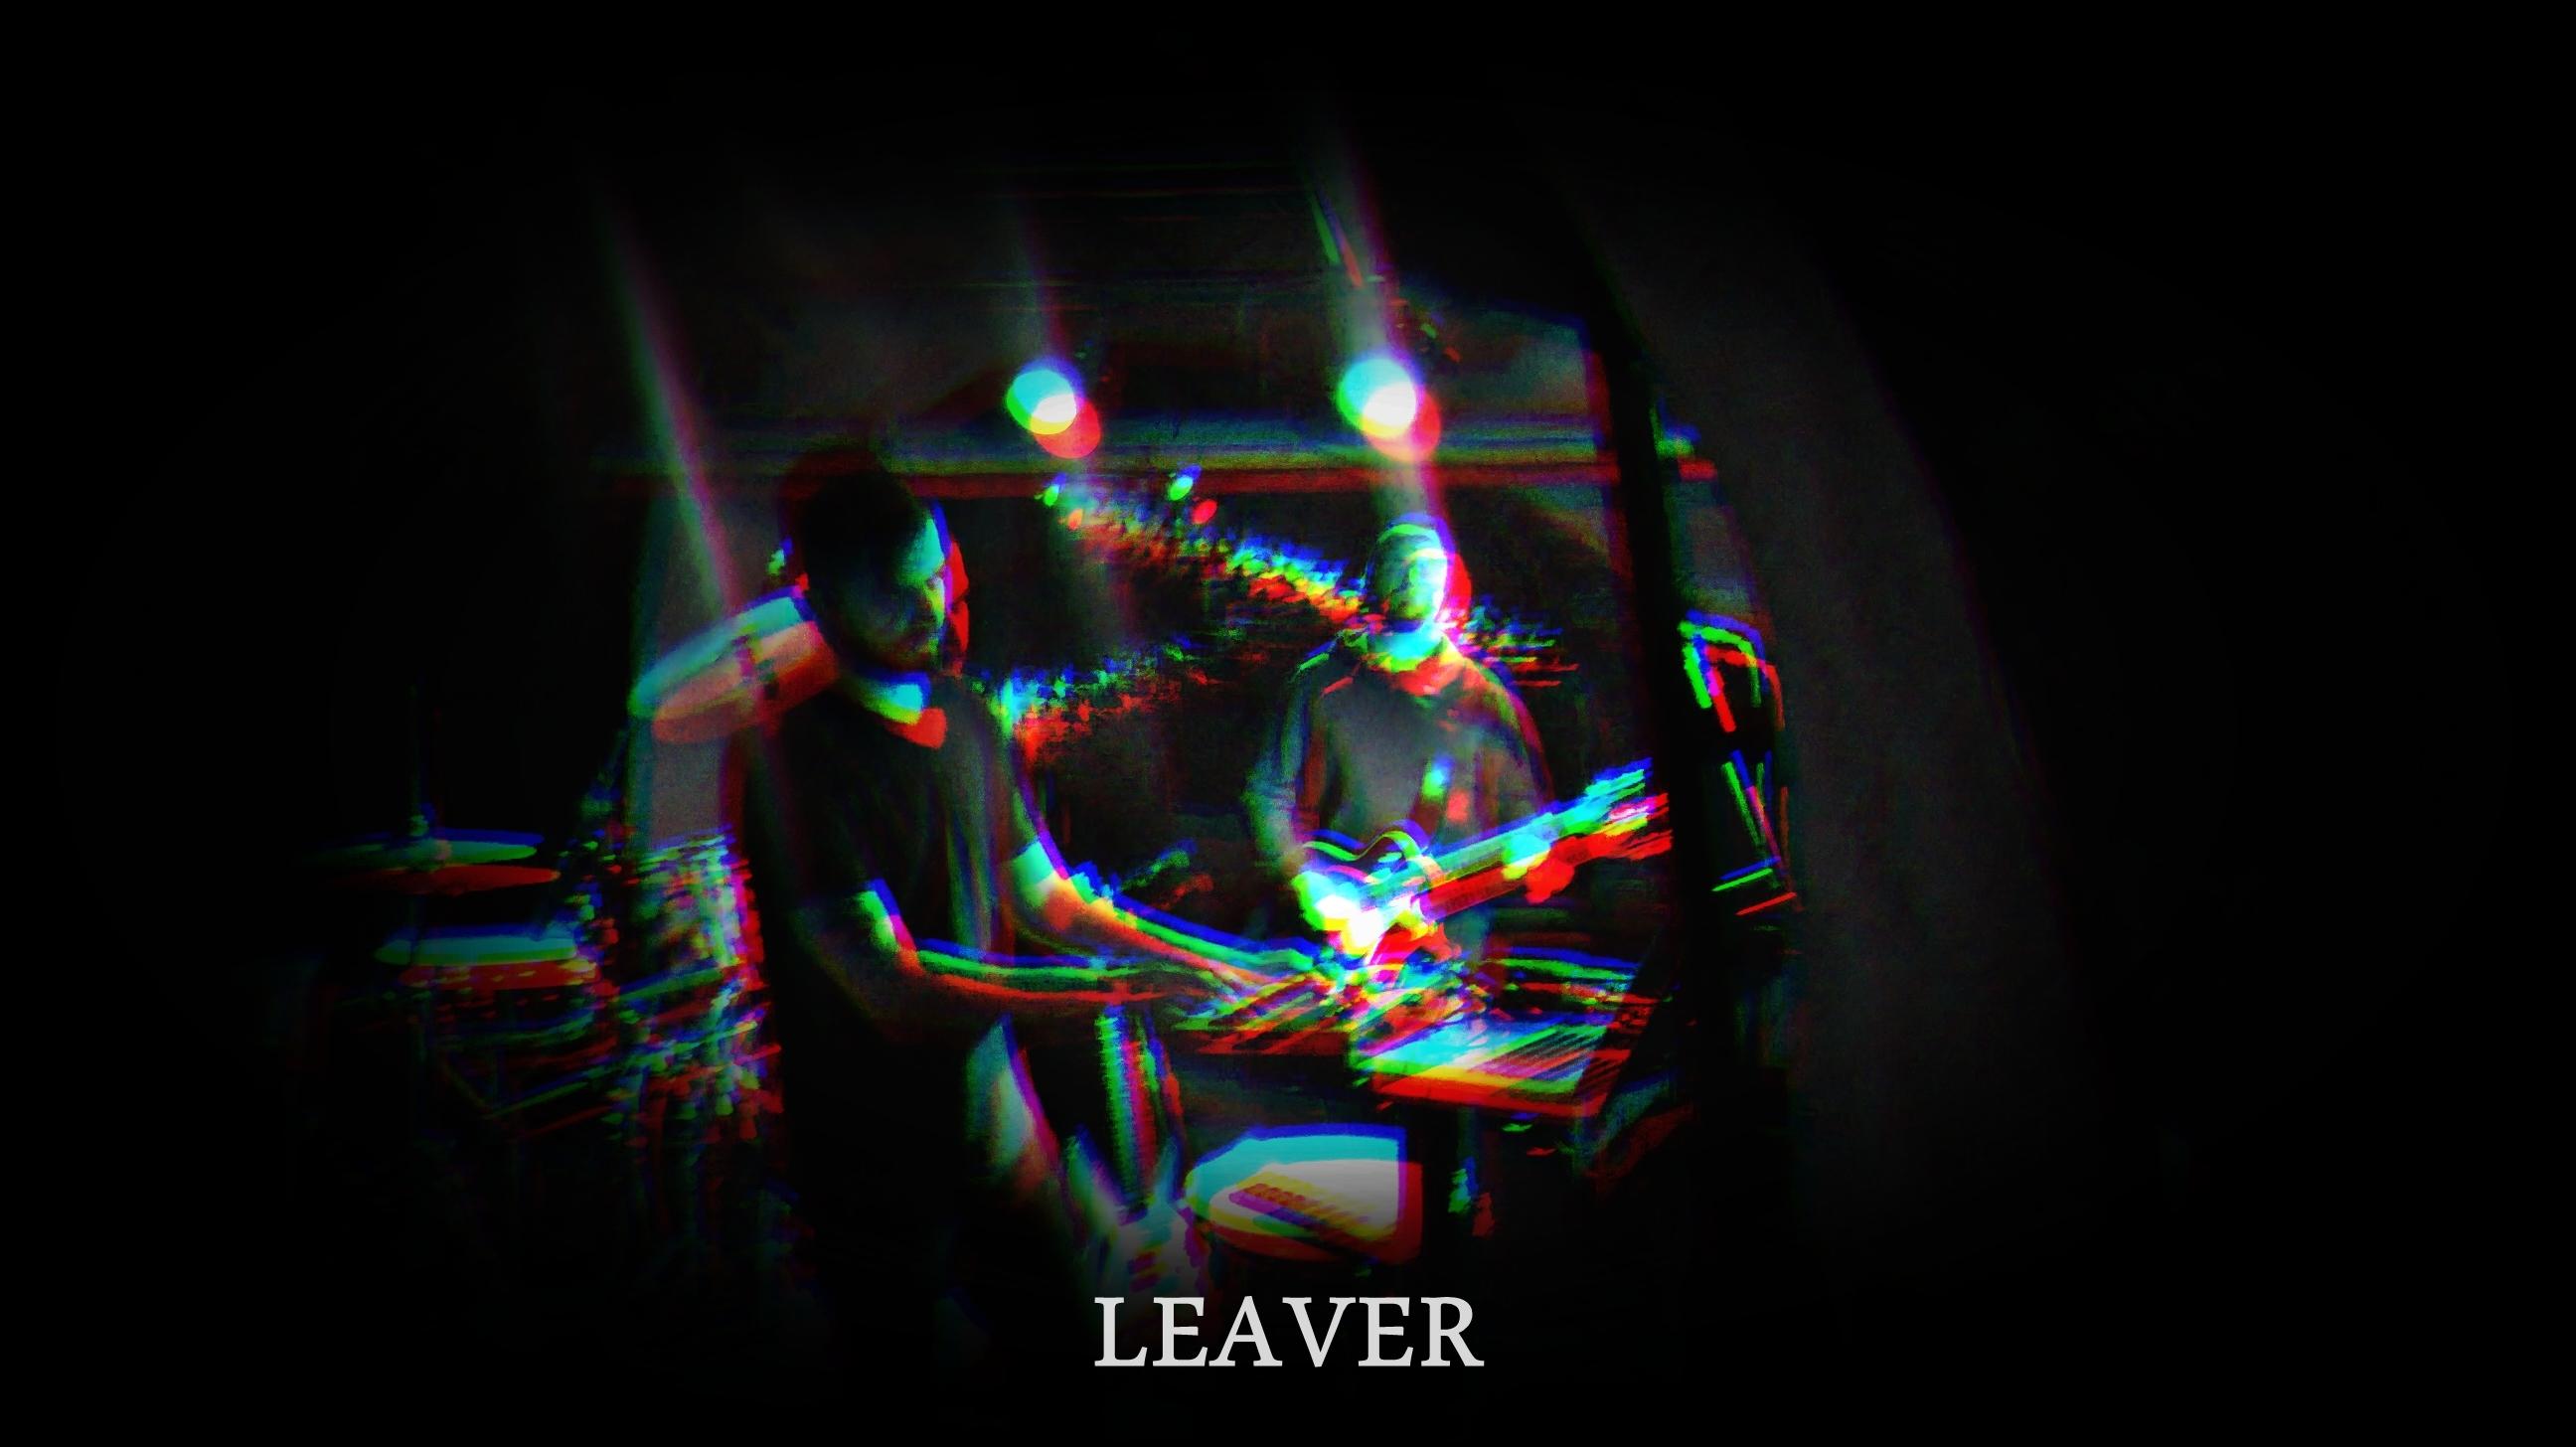 Leaver